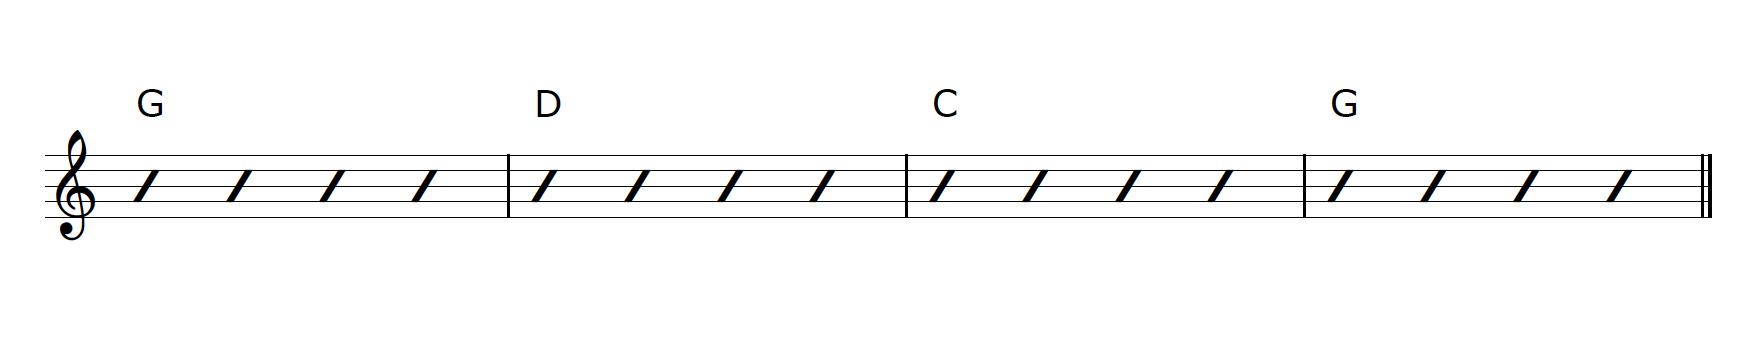 Guitar Capo G Major Progression